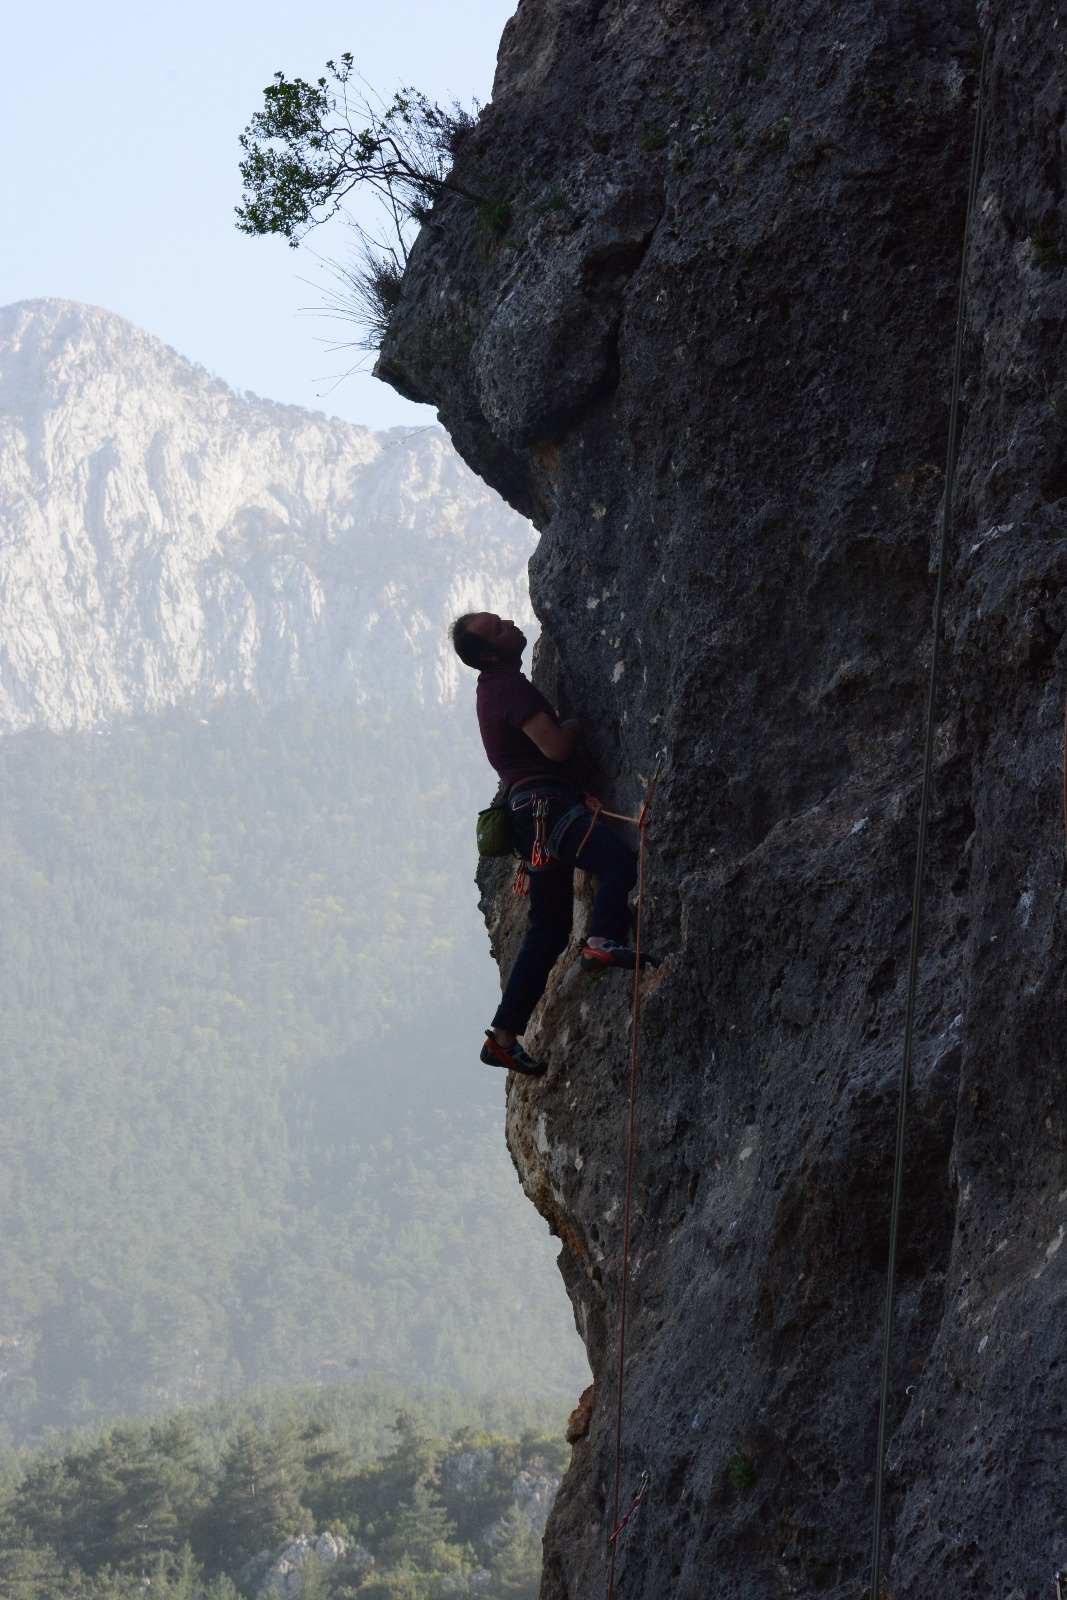 Geyikbayırı Tırmanışı Mustafa Kalaycı